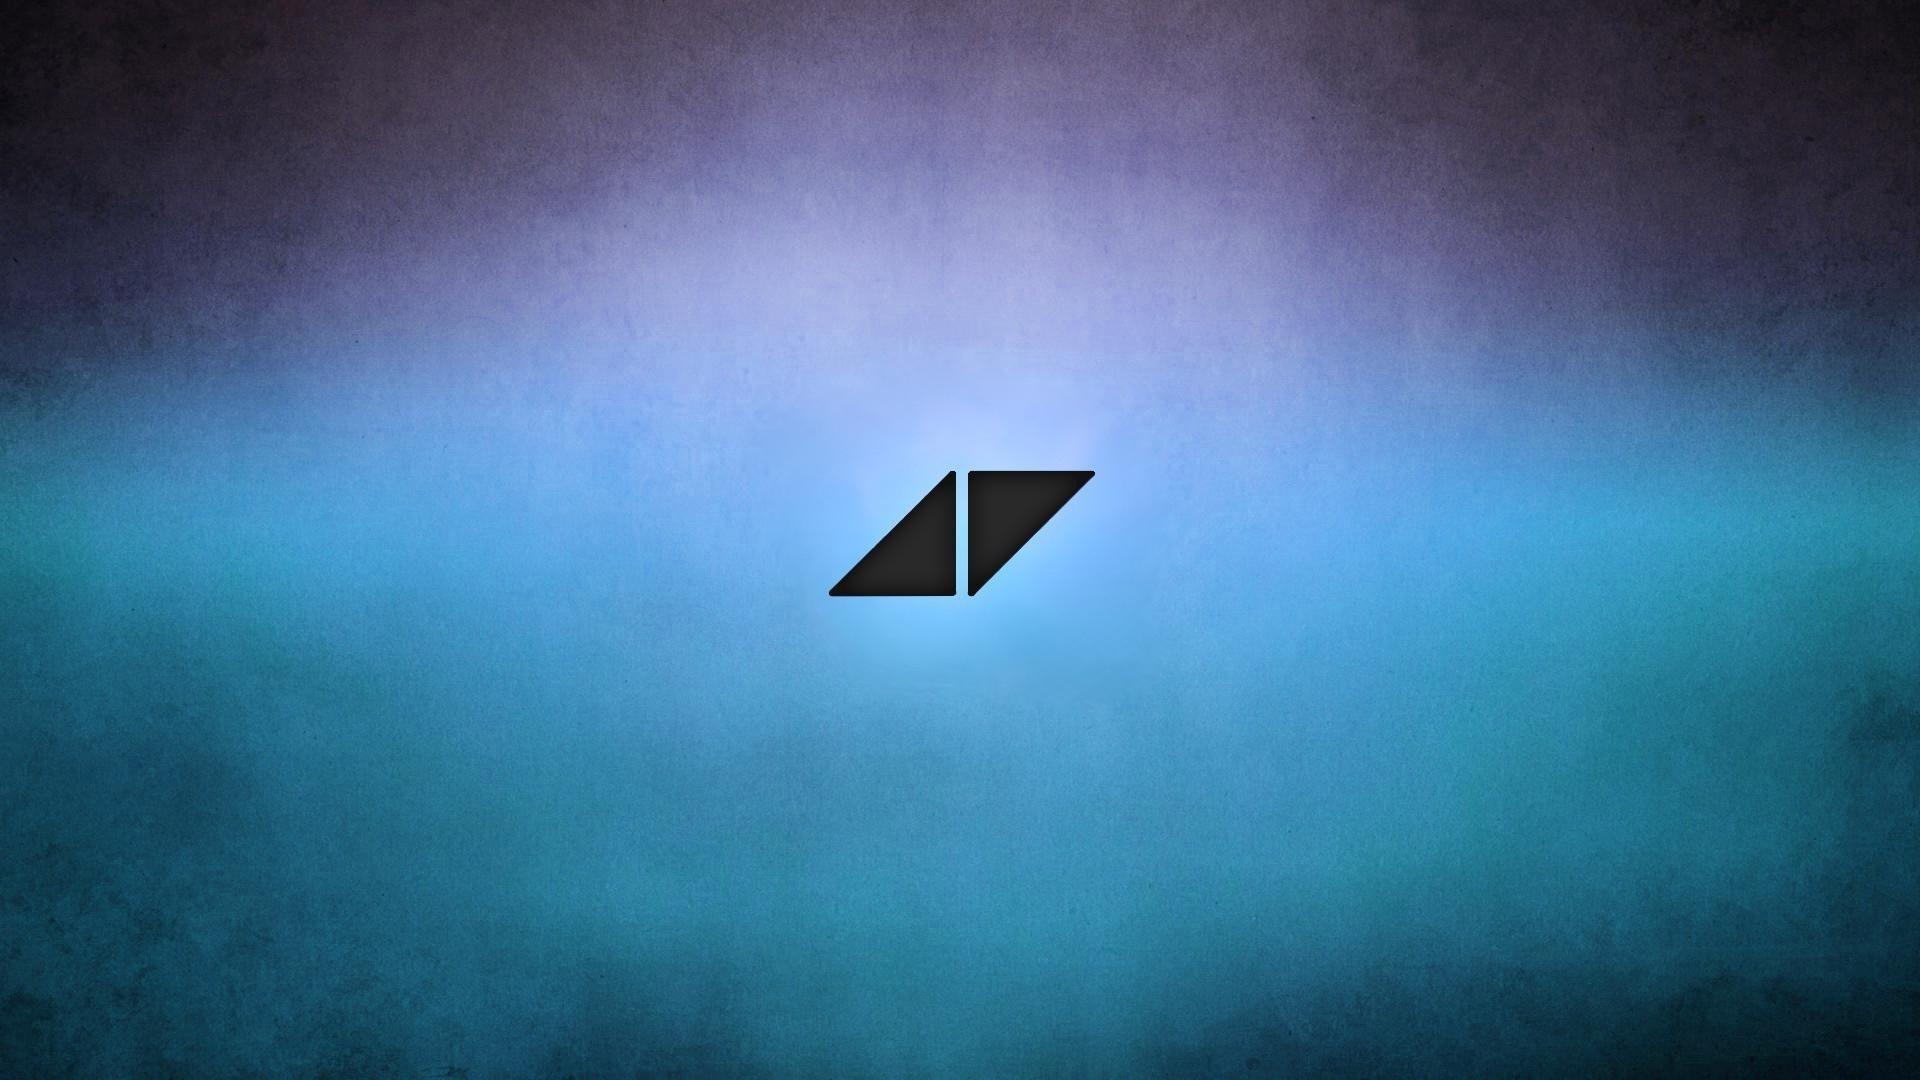 Avicii Triangles Logo HD Wallpaper DJ